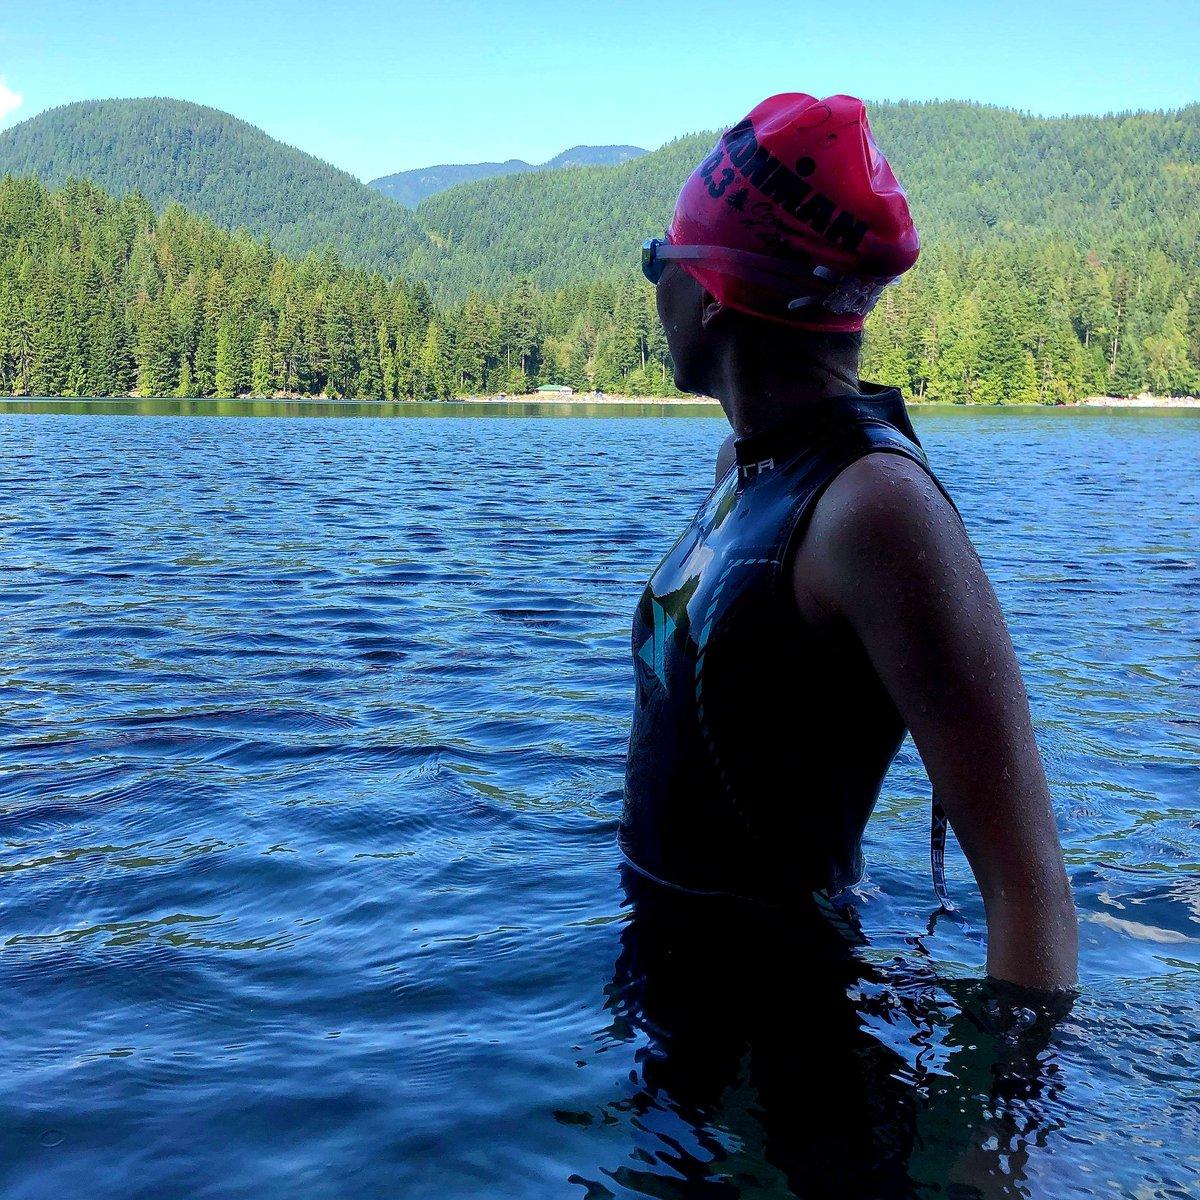 New wetsuit day! Feeling more freedom with a sleevless from @XTERRAWETSUITS #xterrawetsuits #triathlontraining #teamtap #endurancetap #fuelsimply #nuunlife #nuunbassador #nuunlove <br>http://pic.twitter.com/Me7eIeZ8jM – à Sasamat Lake